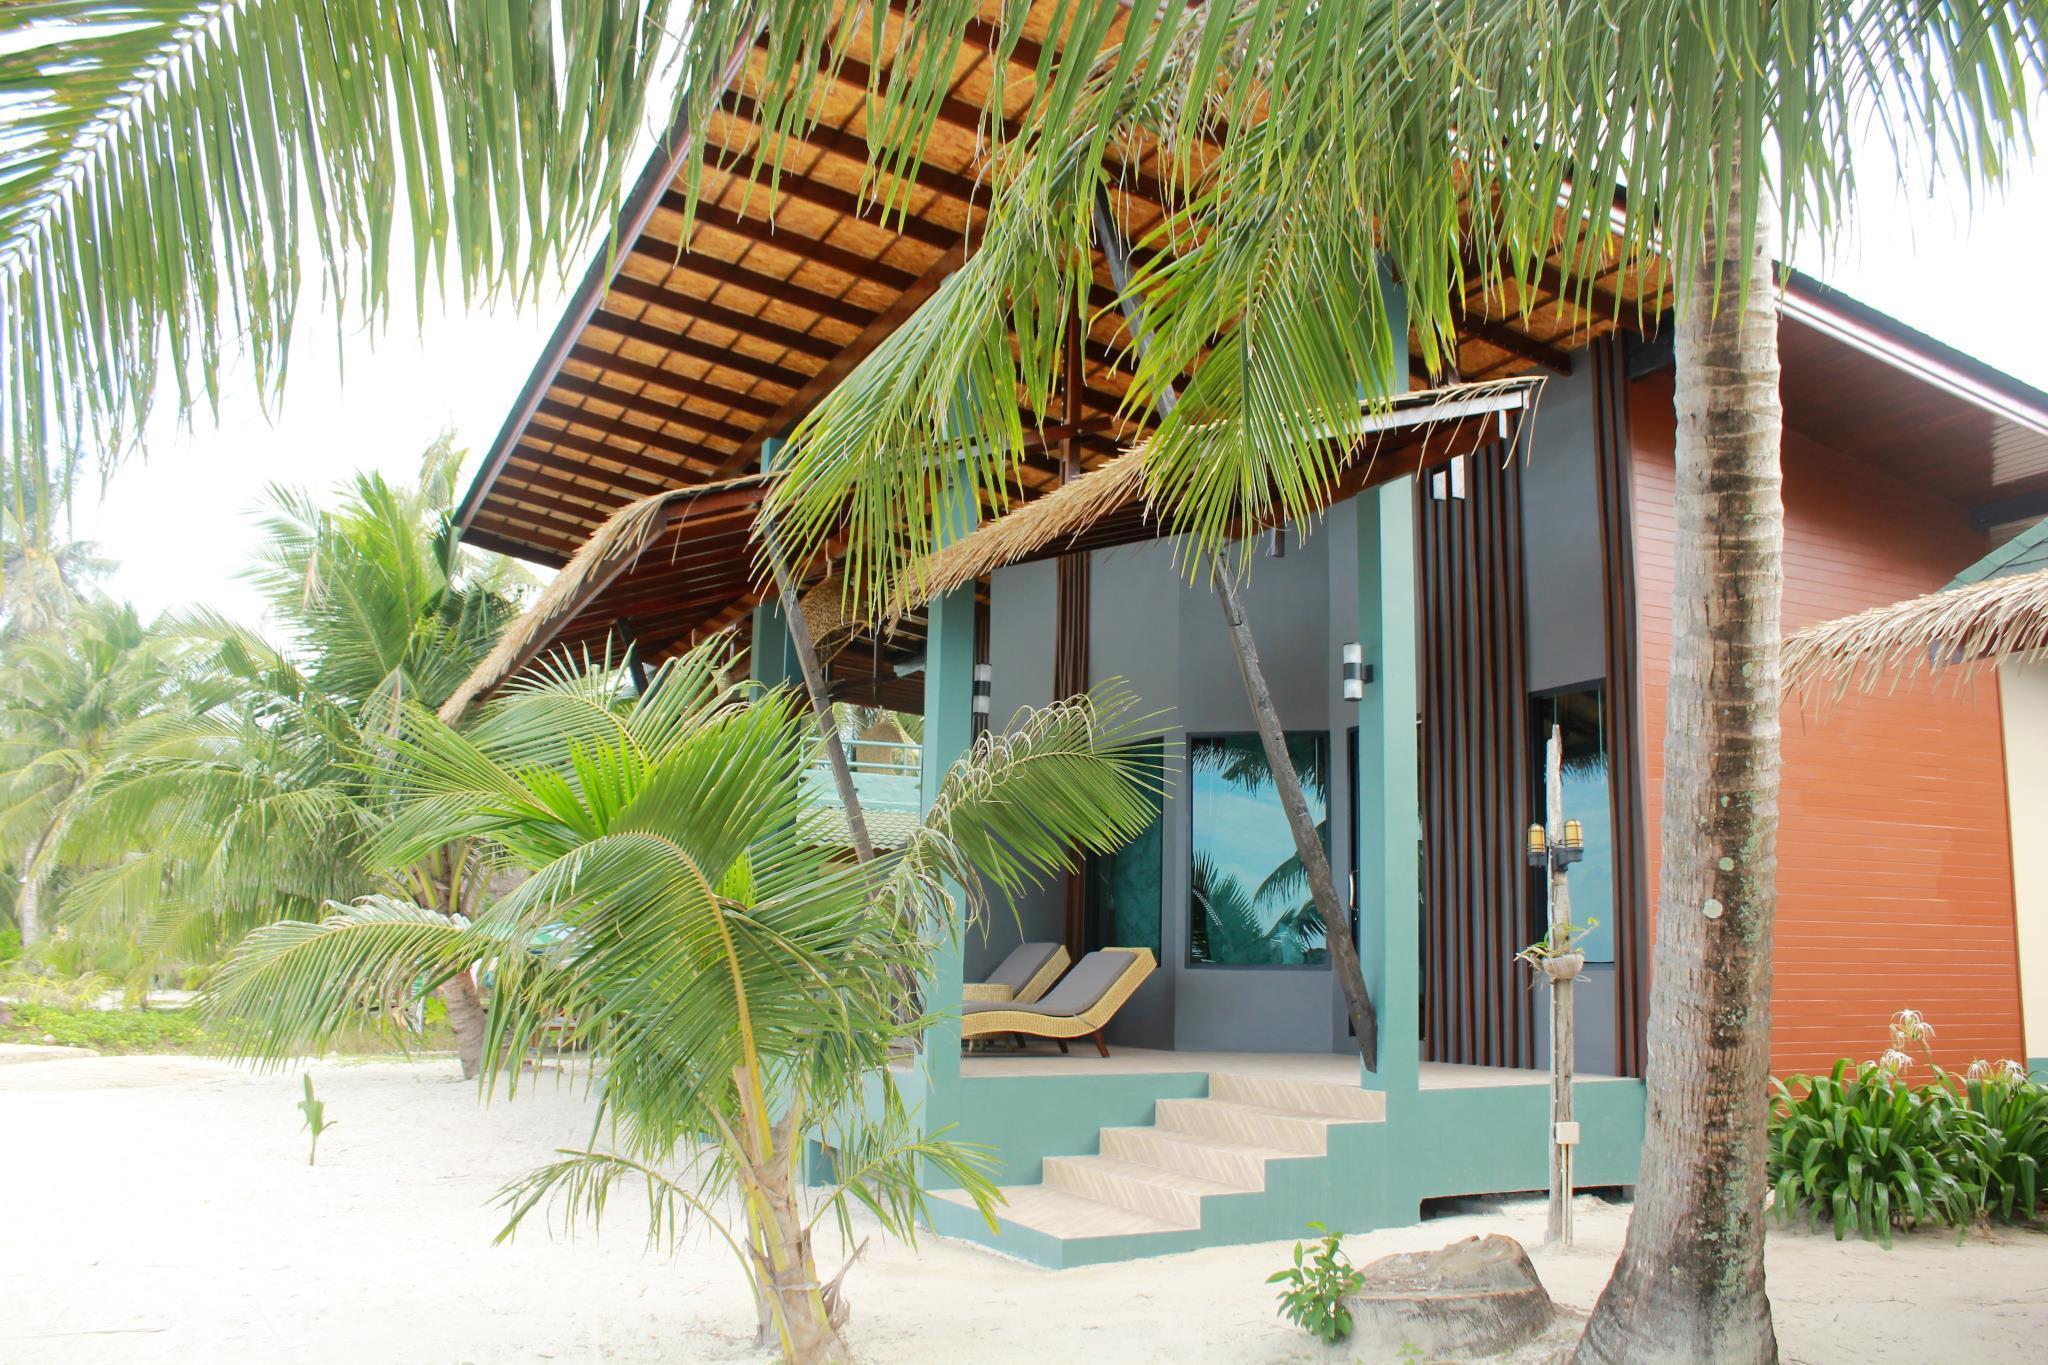 Best Price on Kai Bae Beach Resort Koh Chang in Koh Chang + Reviews